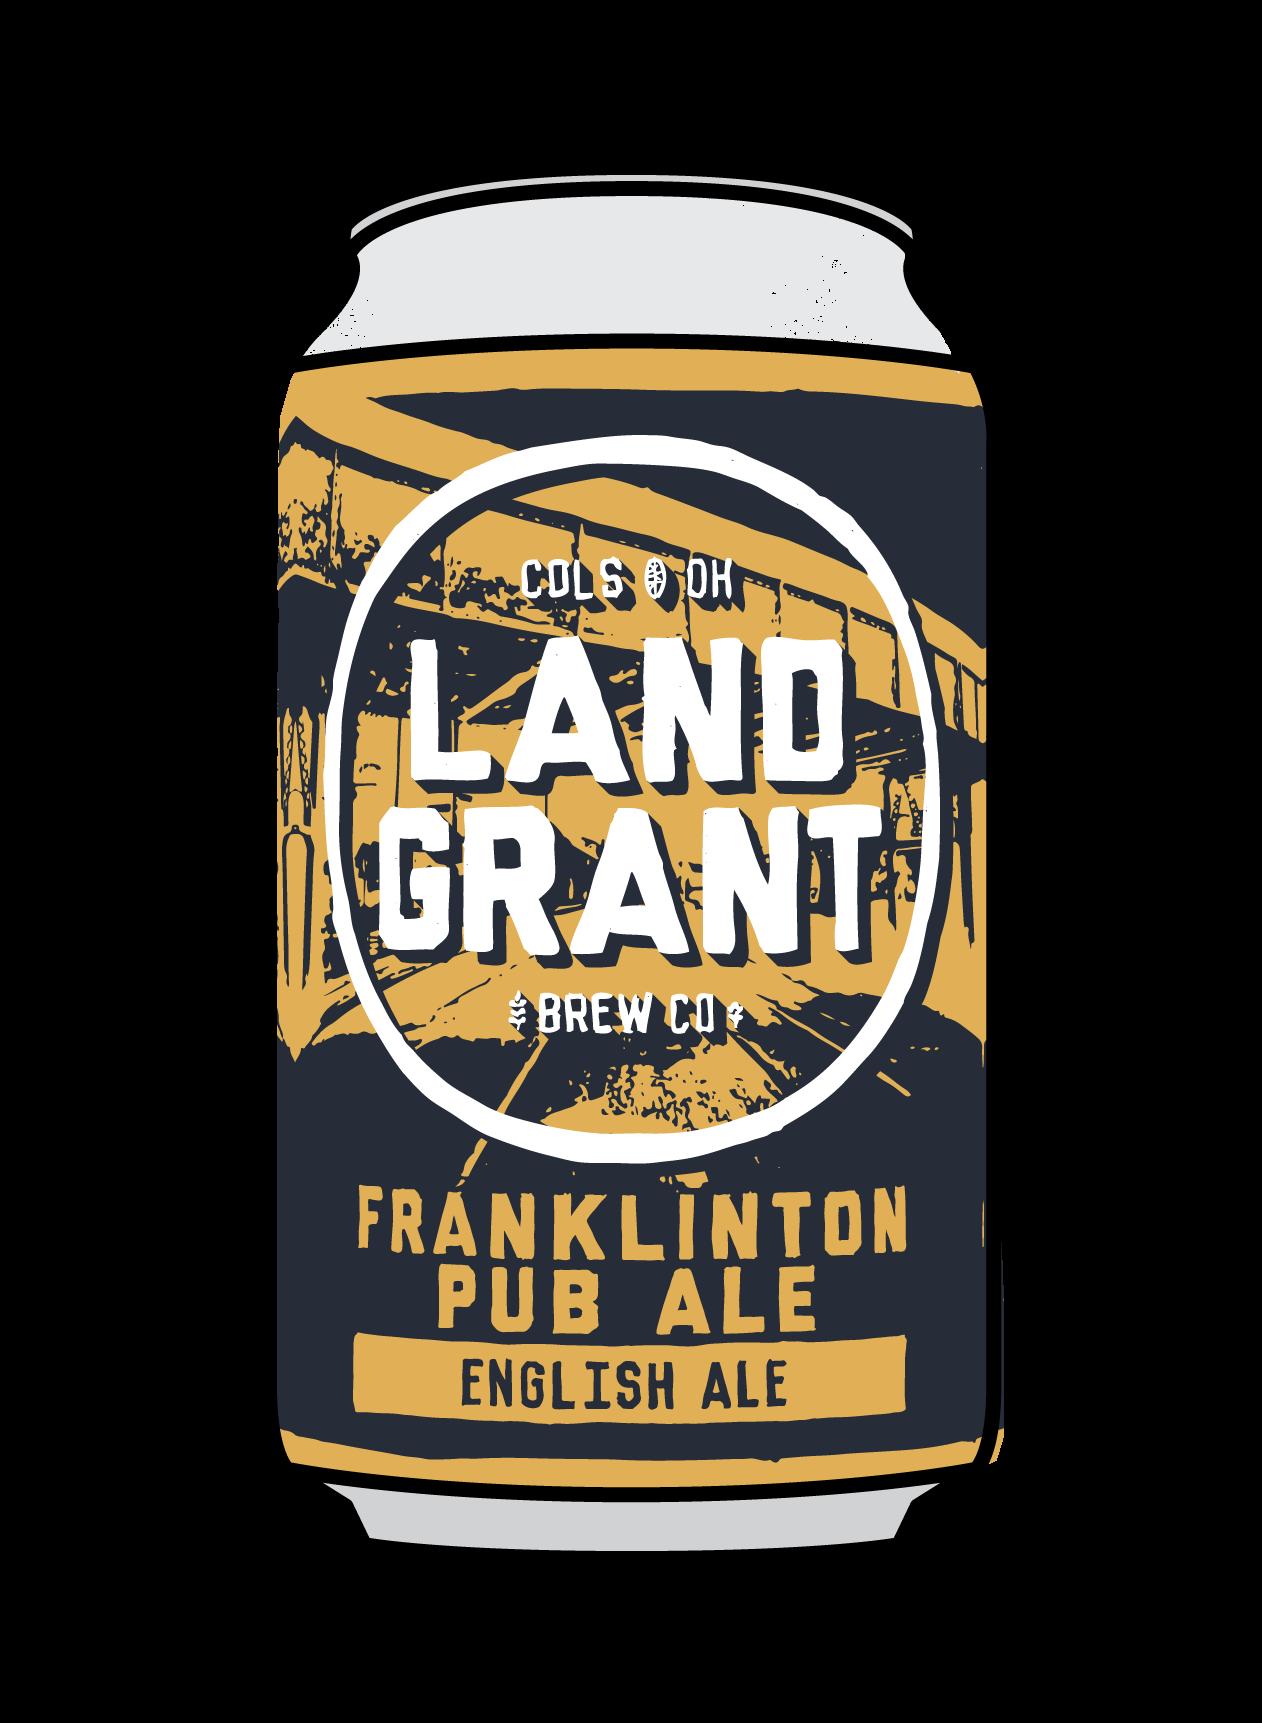 Franklinton Pub Ale Image